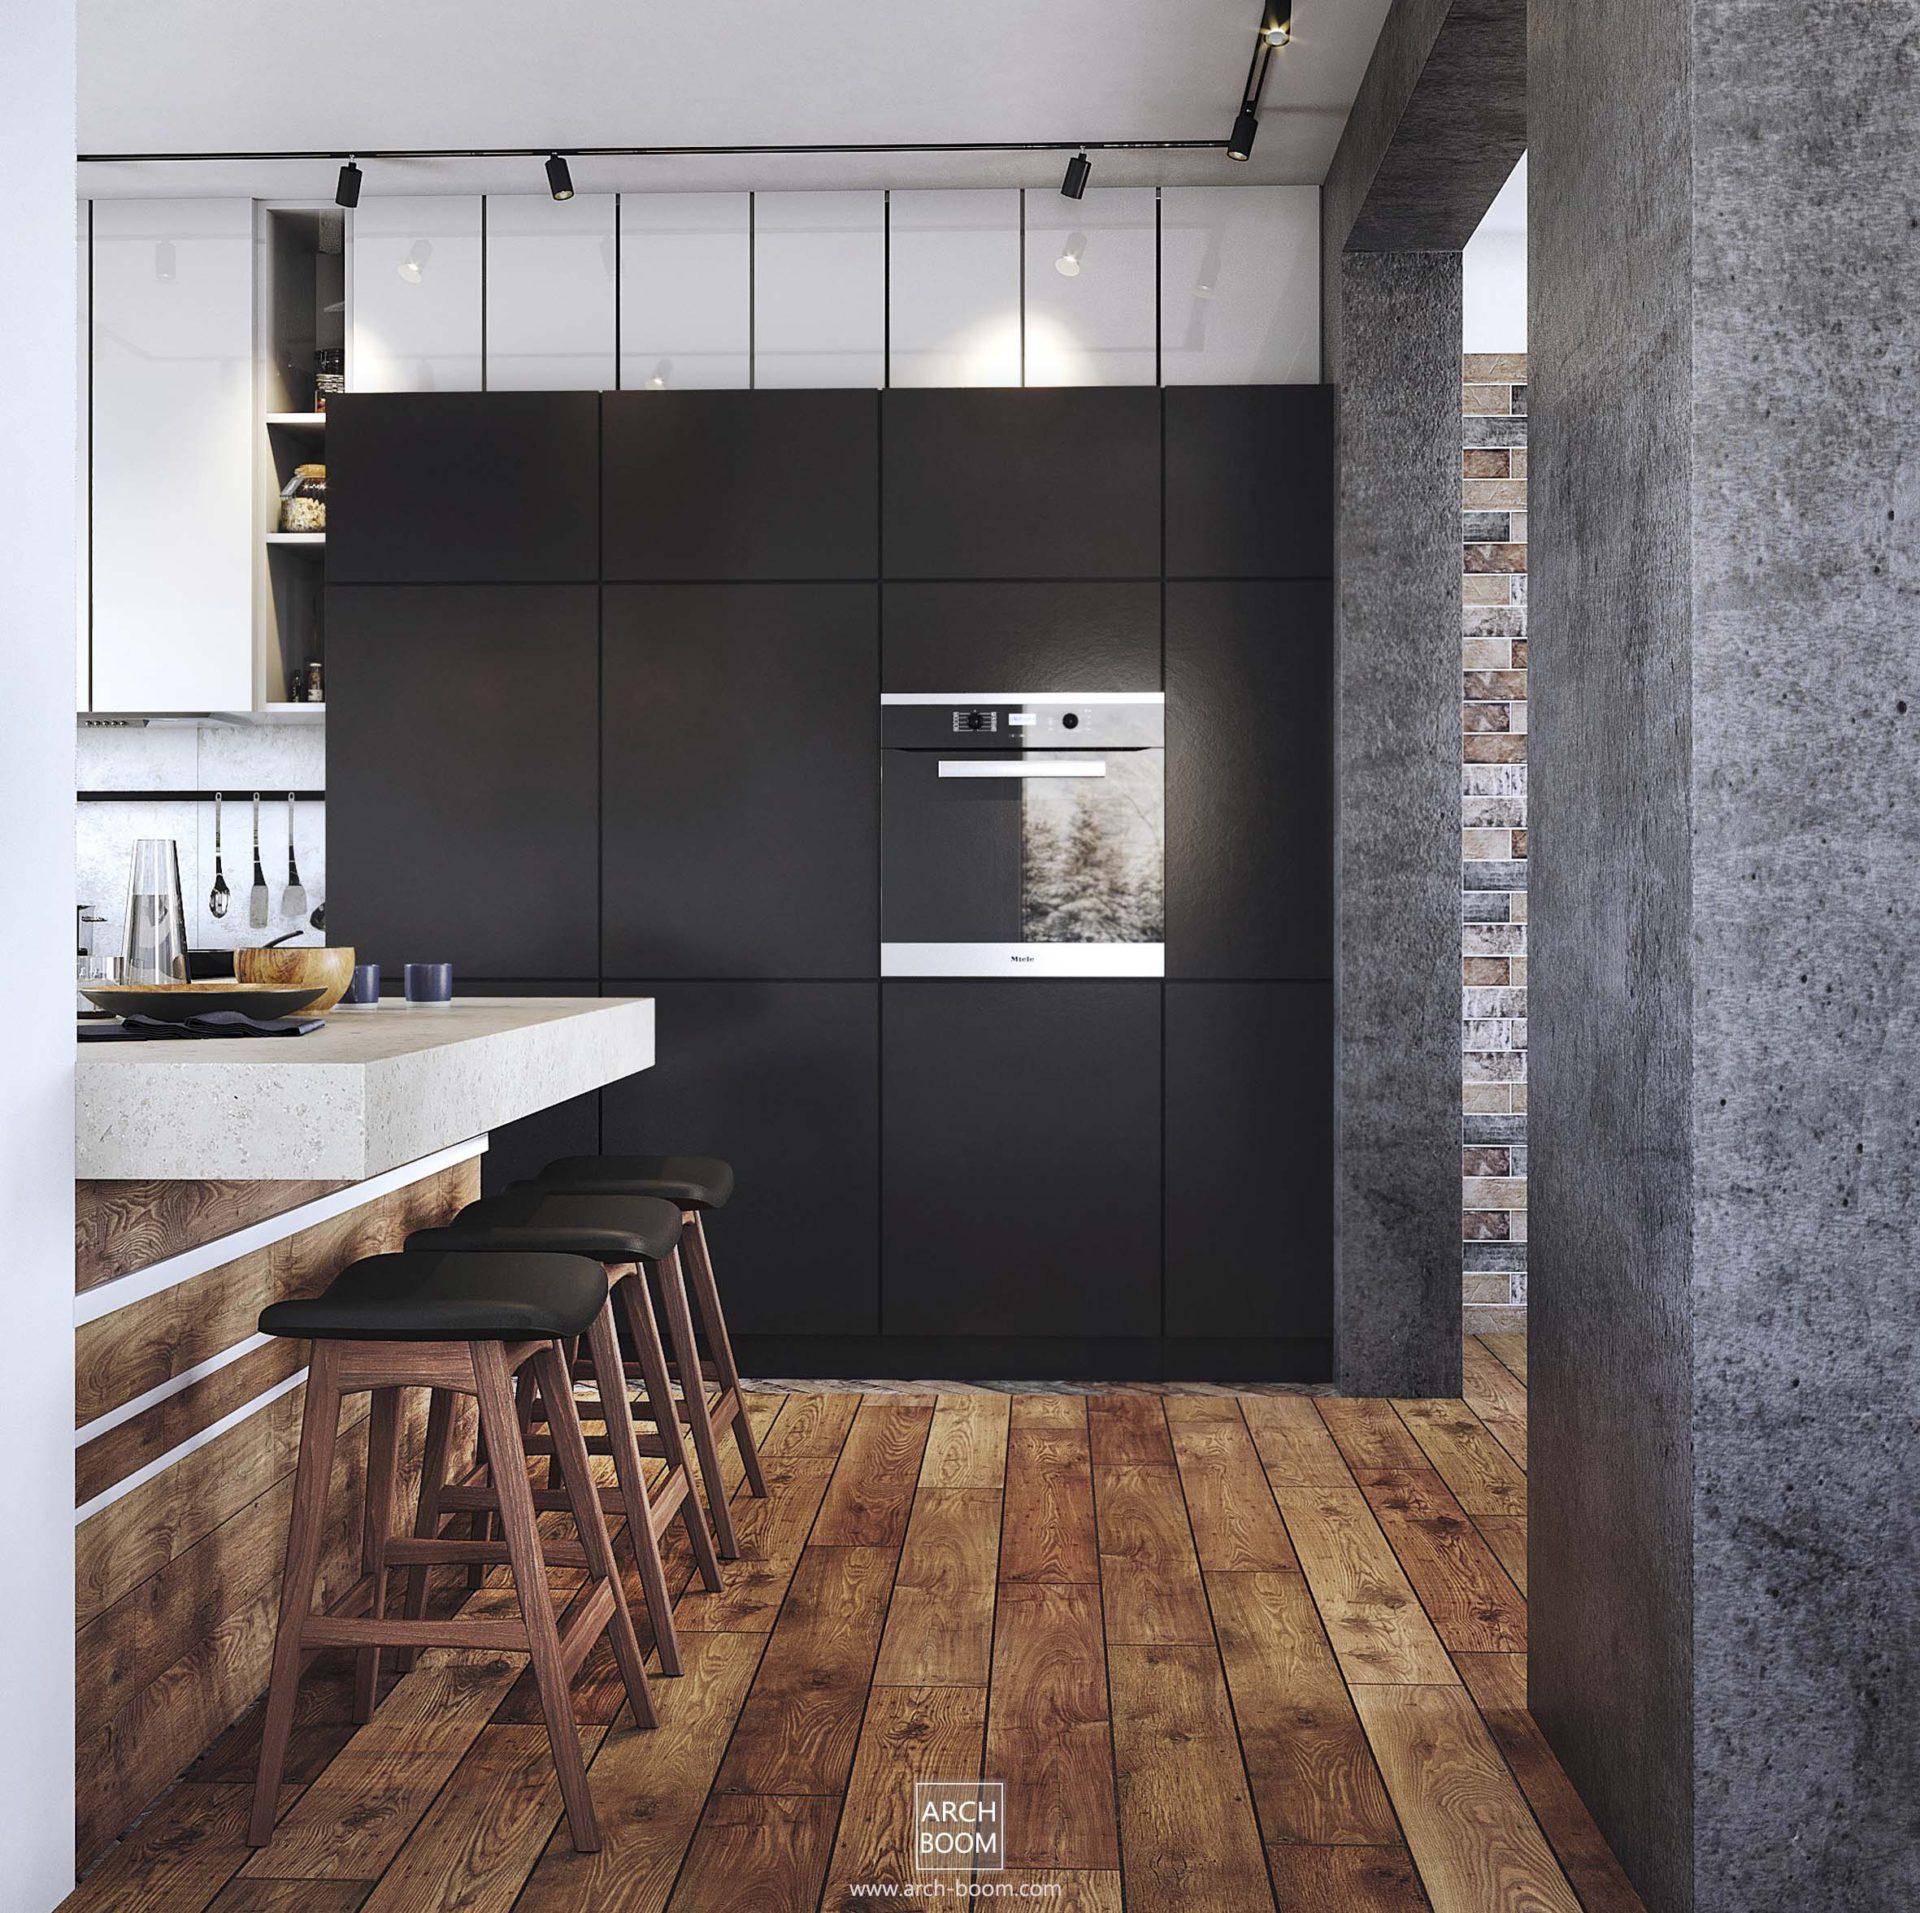 Czarna szafa w kuchni